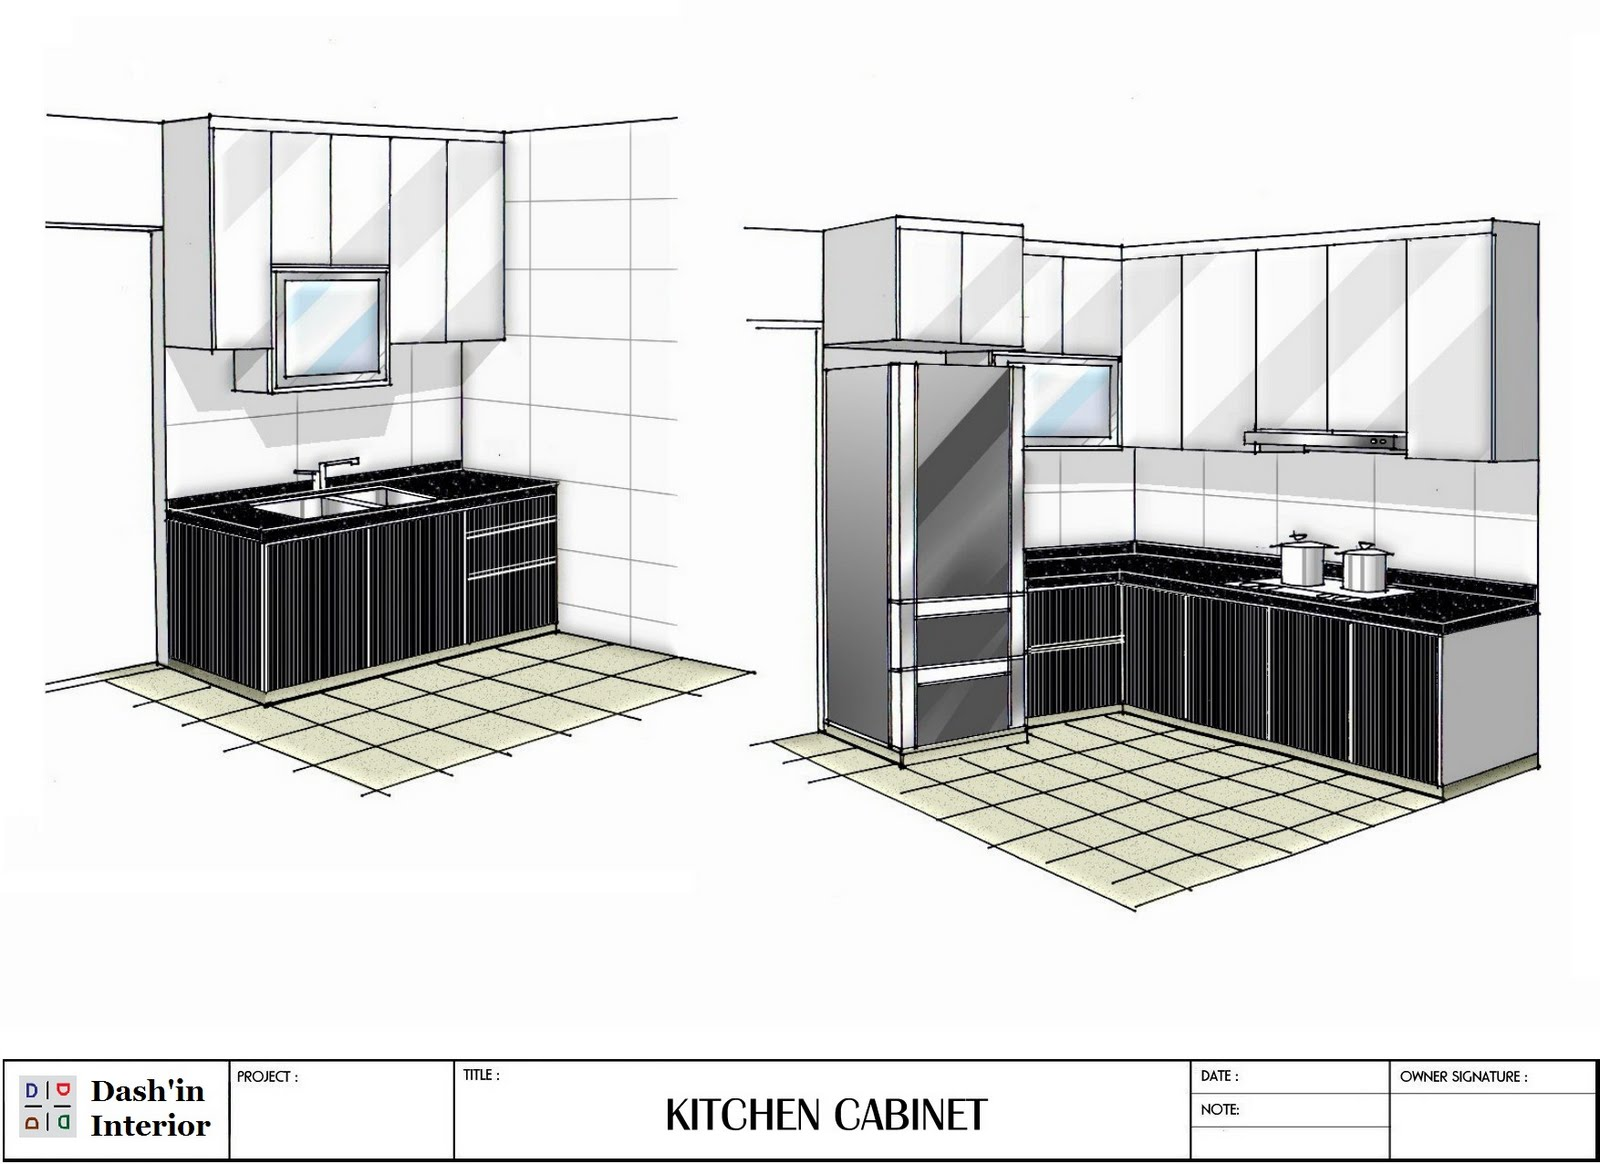 Magnificent Hand Drawn Kitchen Cabinets Design 1600 x 1164 · 204 kB · jpeg